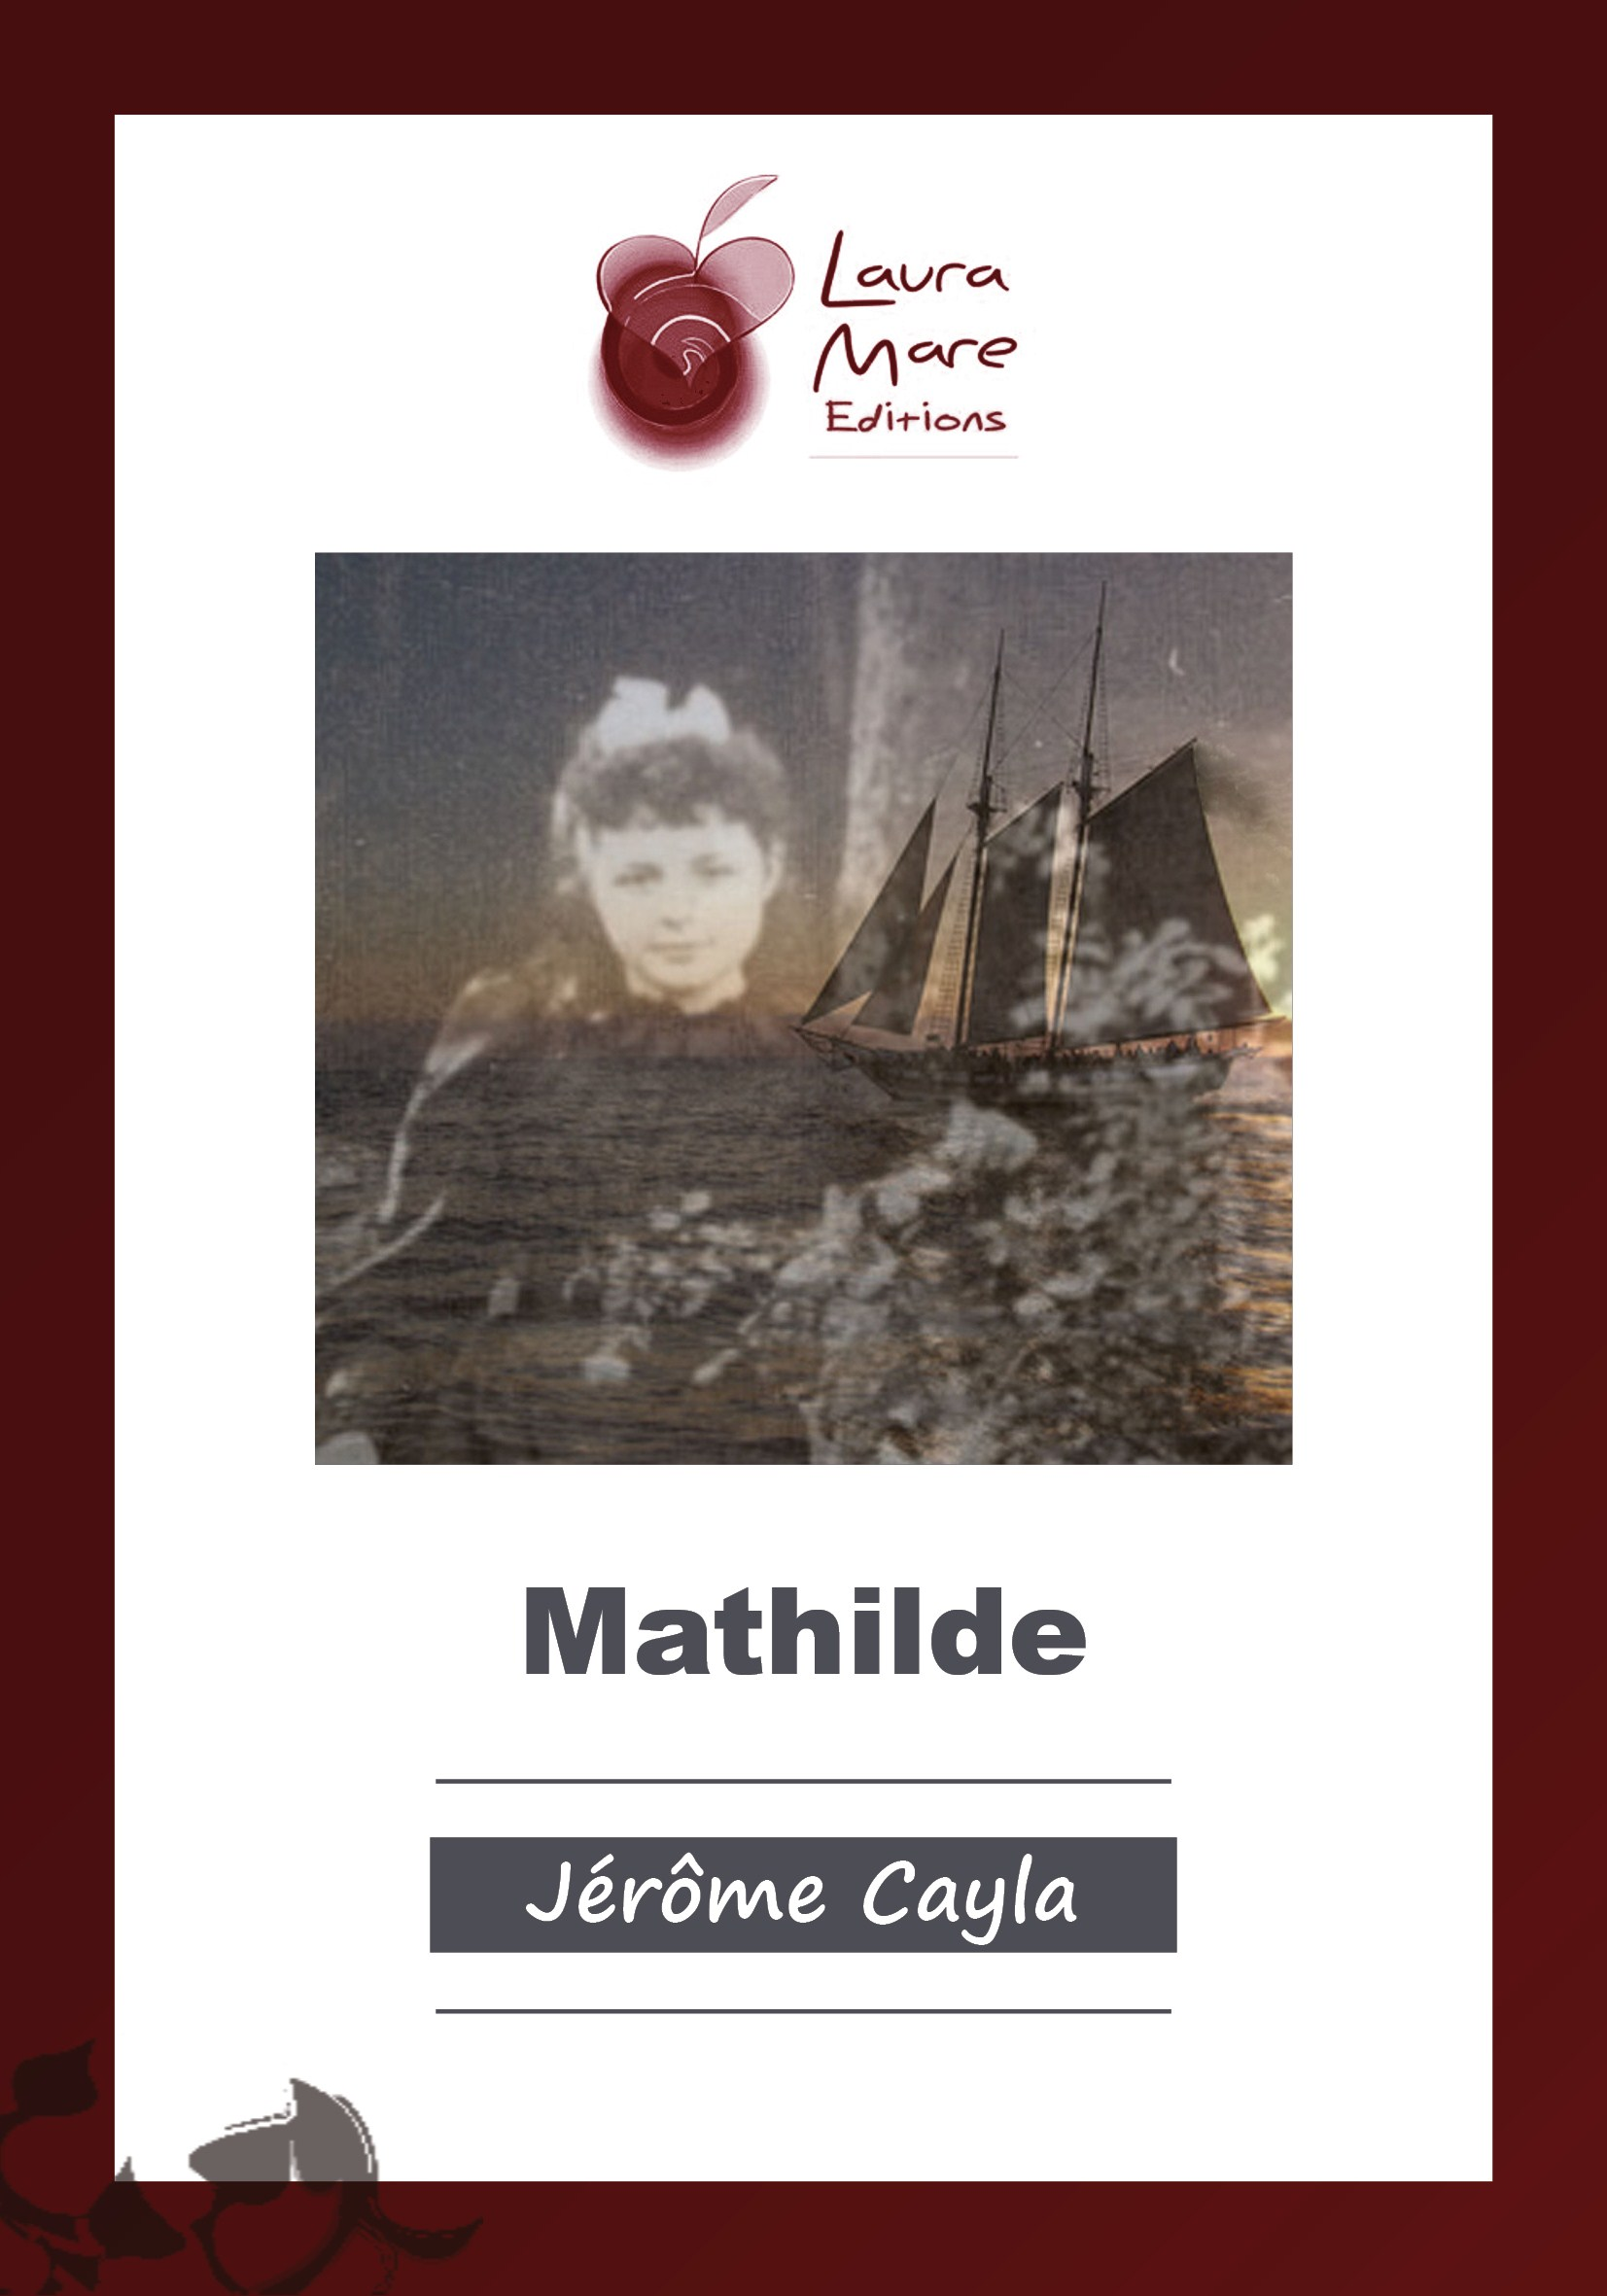 Mathilde_4c7fcb72780d3